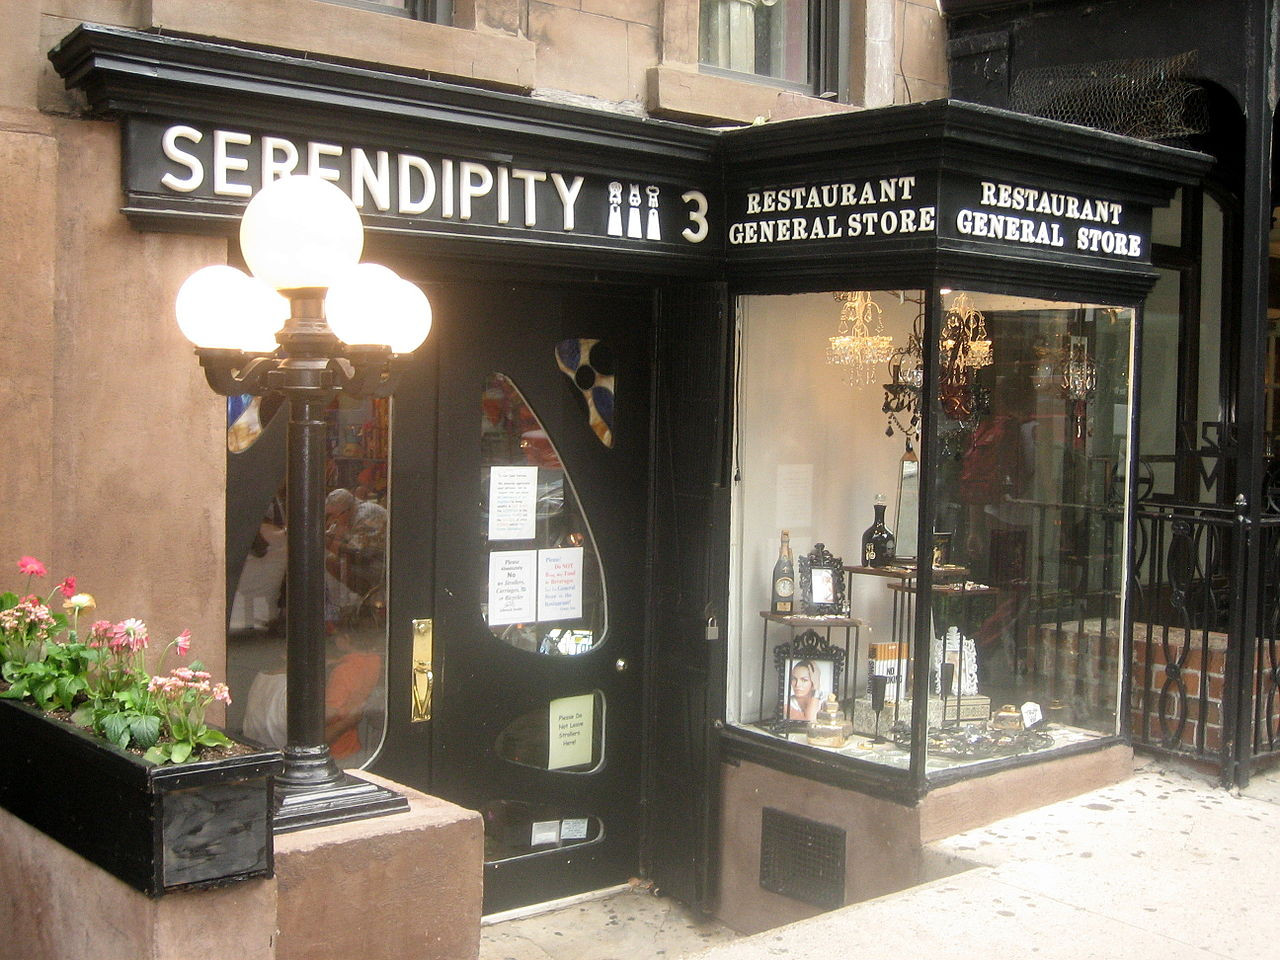 Dessert Restaurants Nyc  File Entrance to Serendipity 3 the New York City dessert